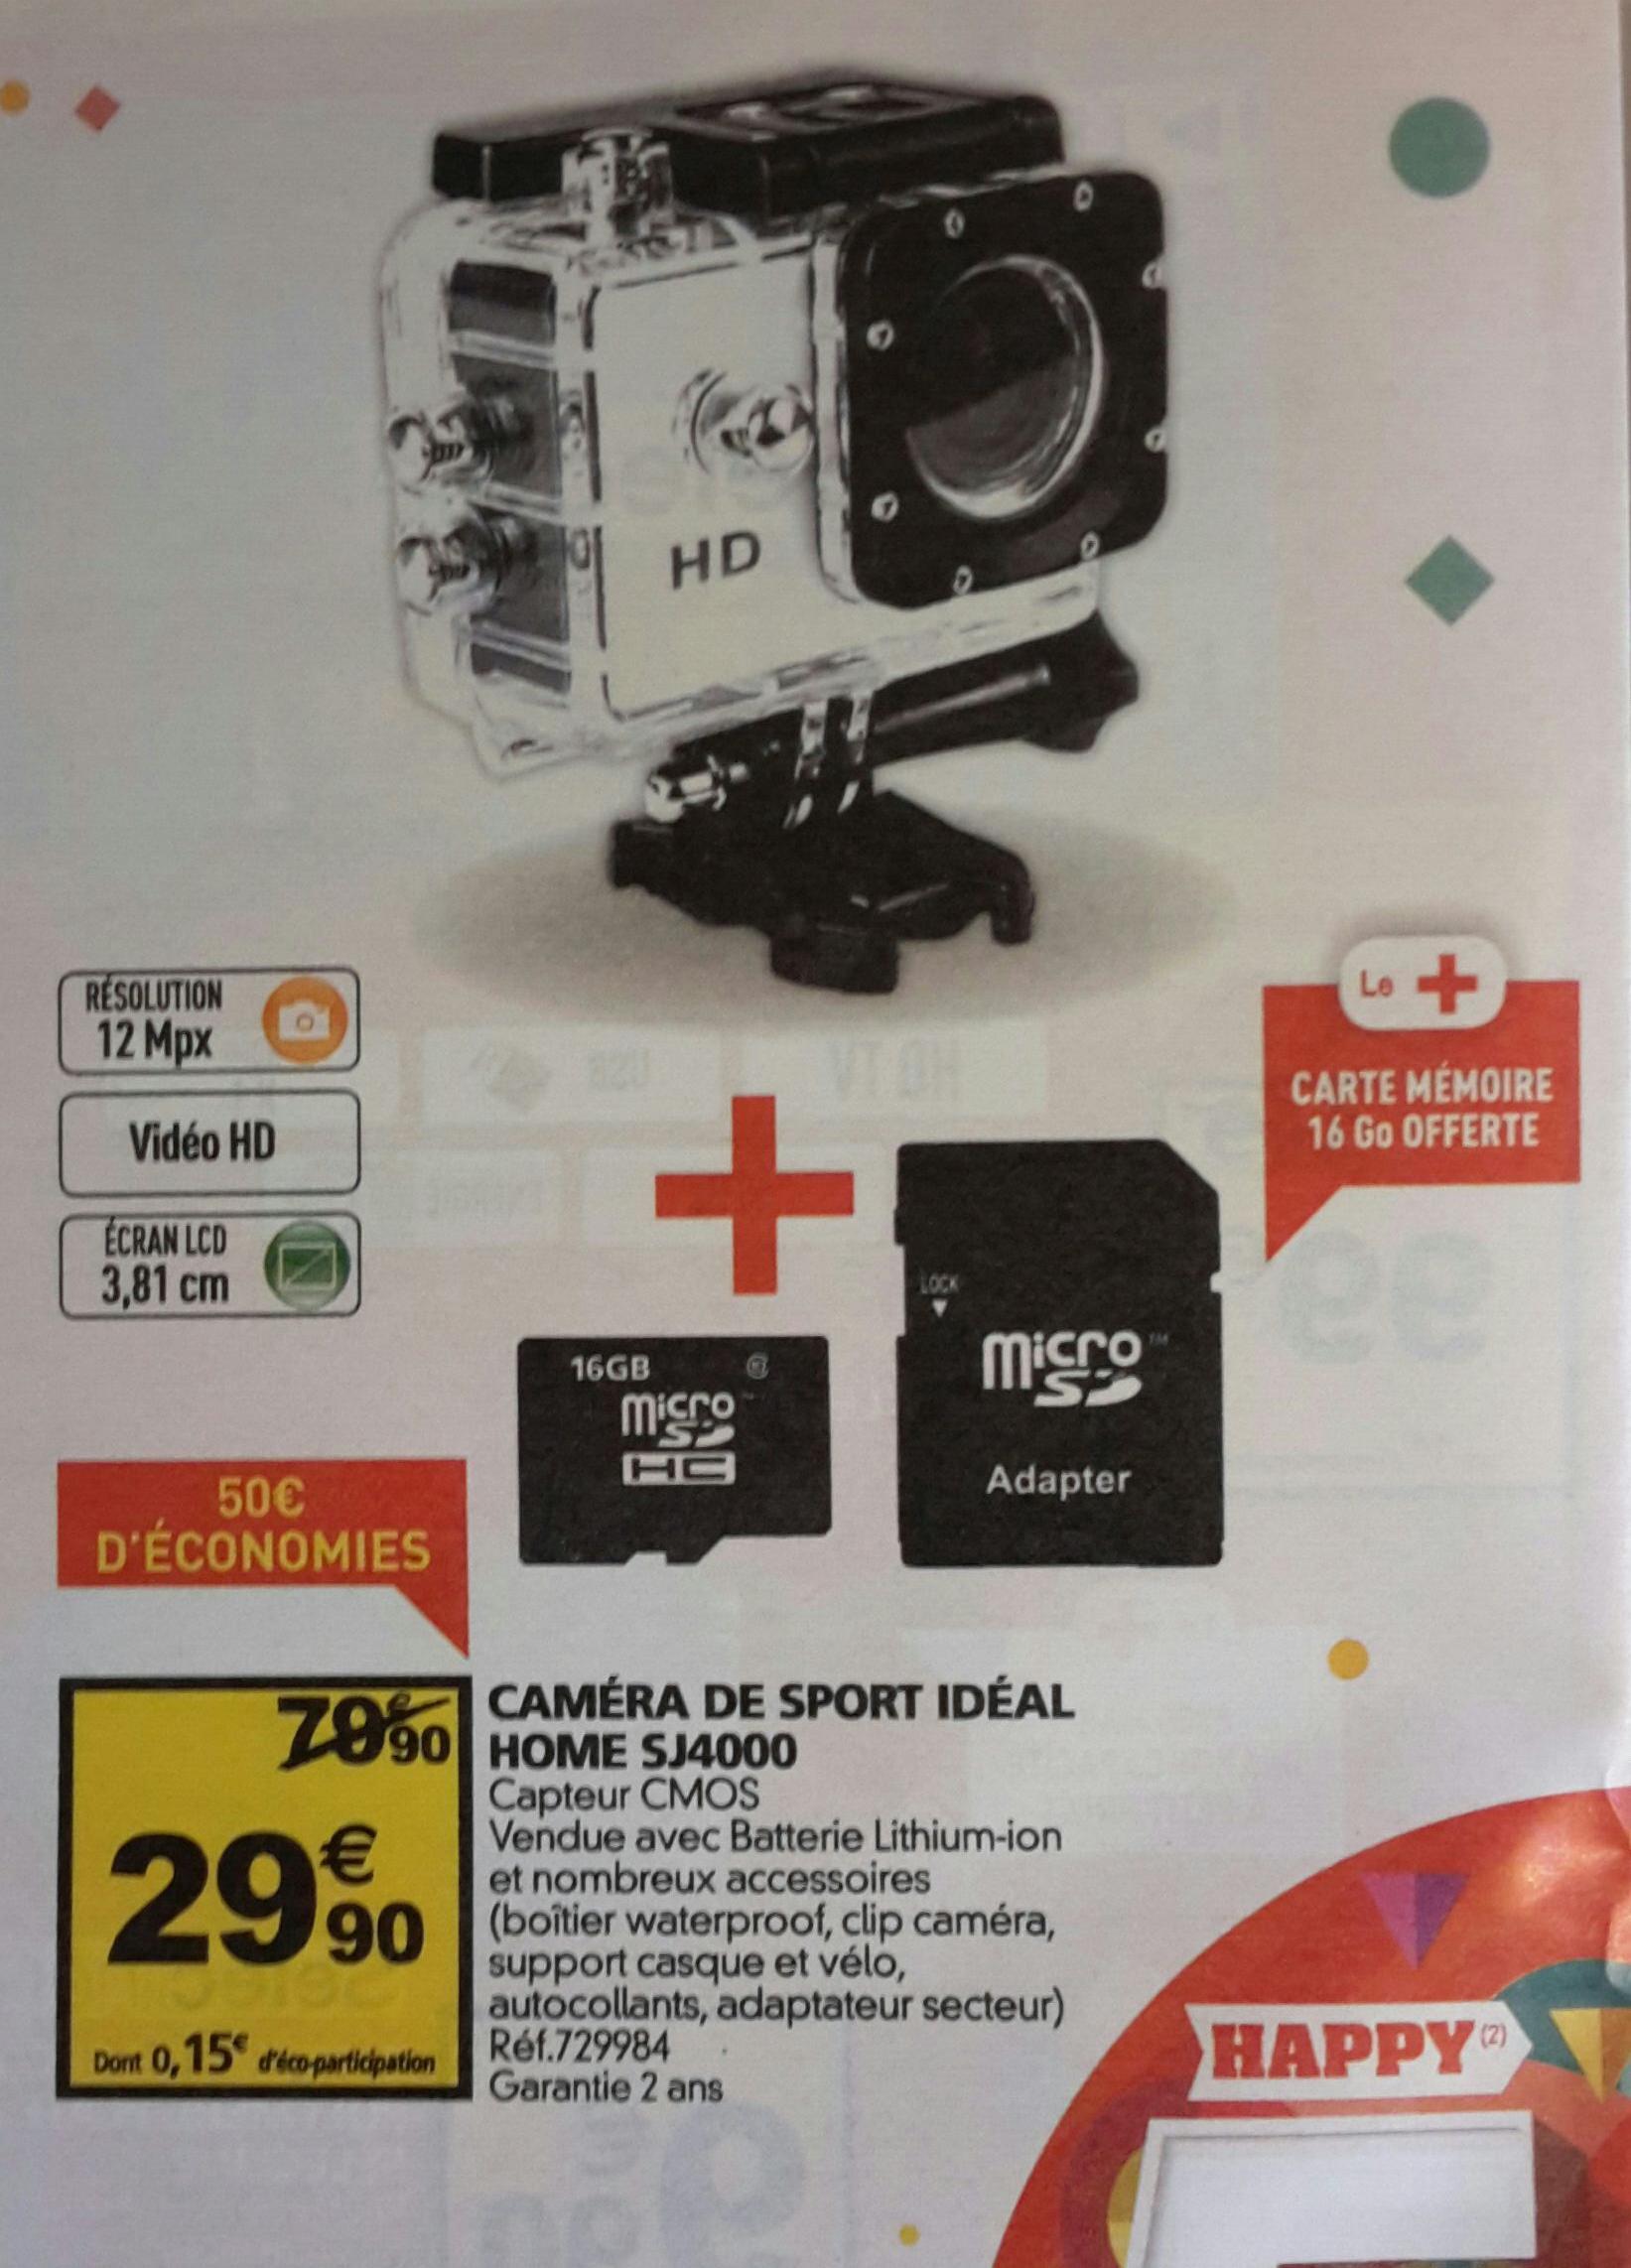 Caméra sportive Idéal Home SJ4000 + Carte micro SDHC 16 Go